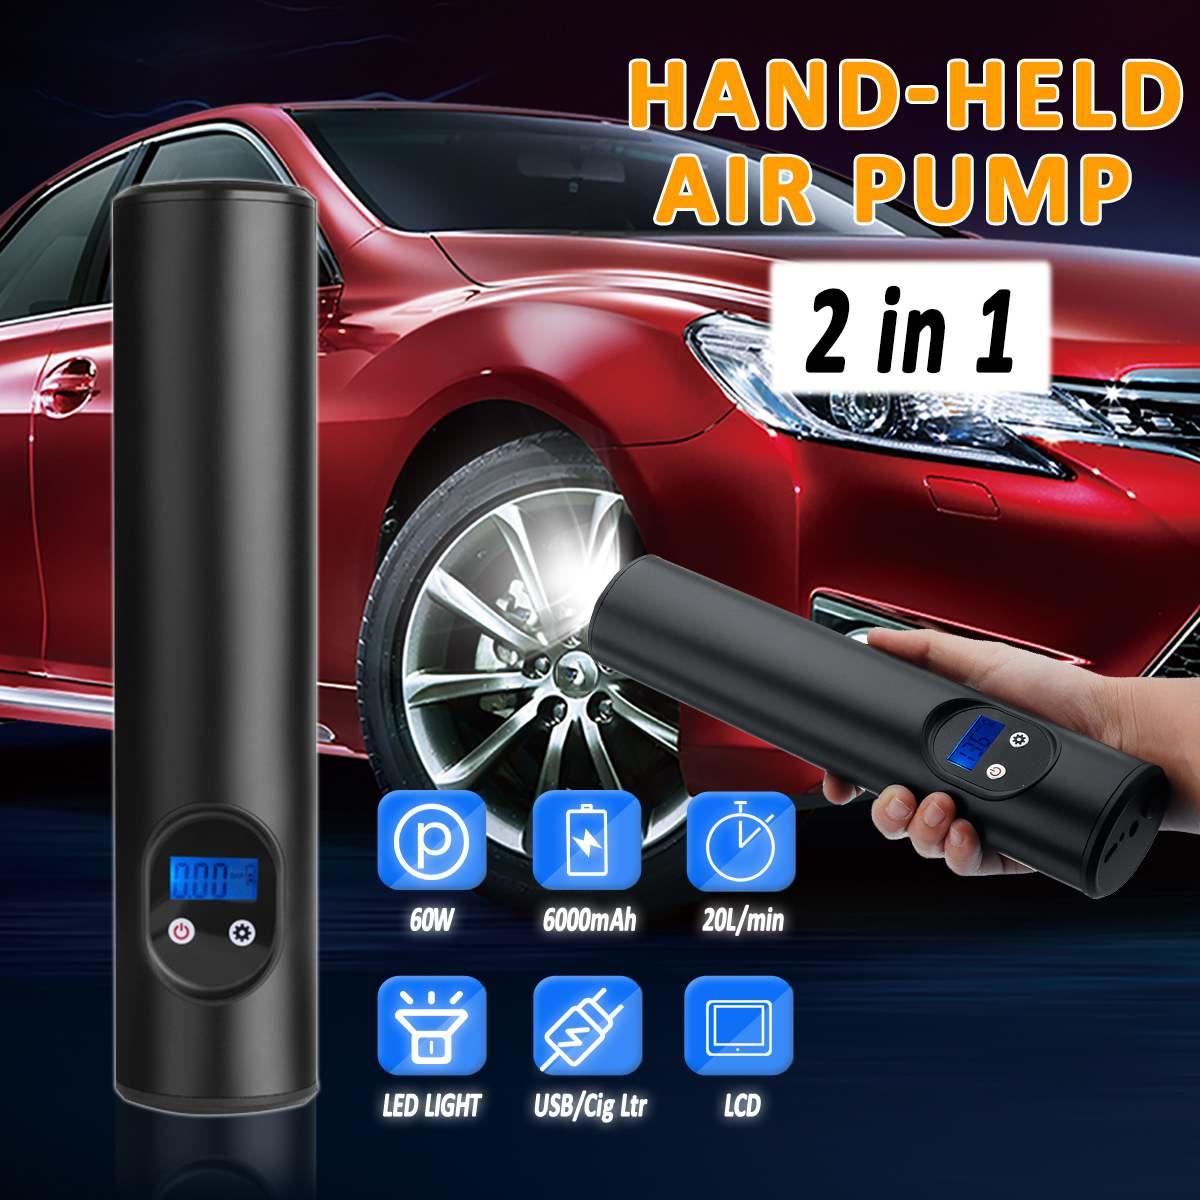 6000mAh 150PSI Car Inflatable Air Pump USB Interface Cordless Air Compressor Car Mini Bike PumpTyre Inflator Motorcycle Tire